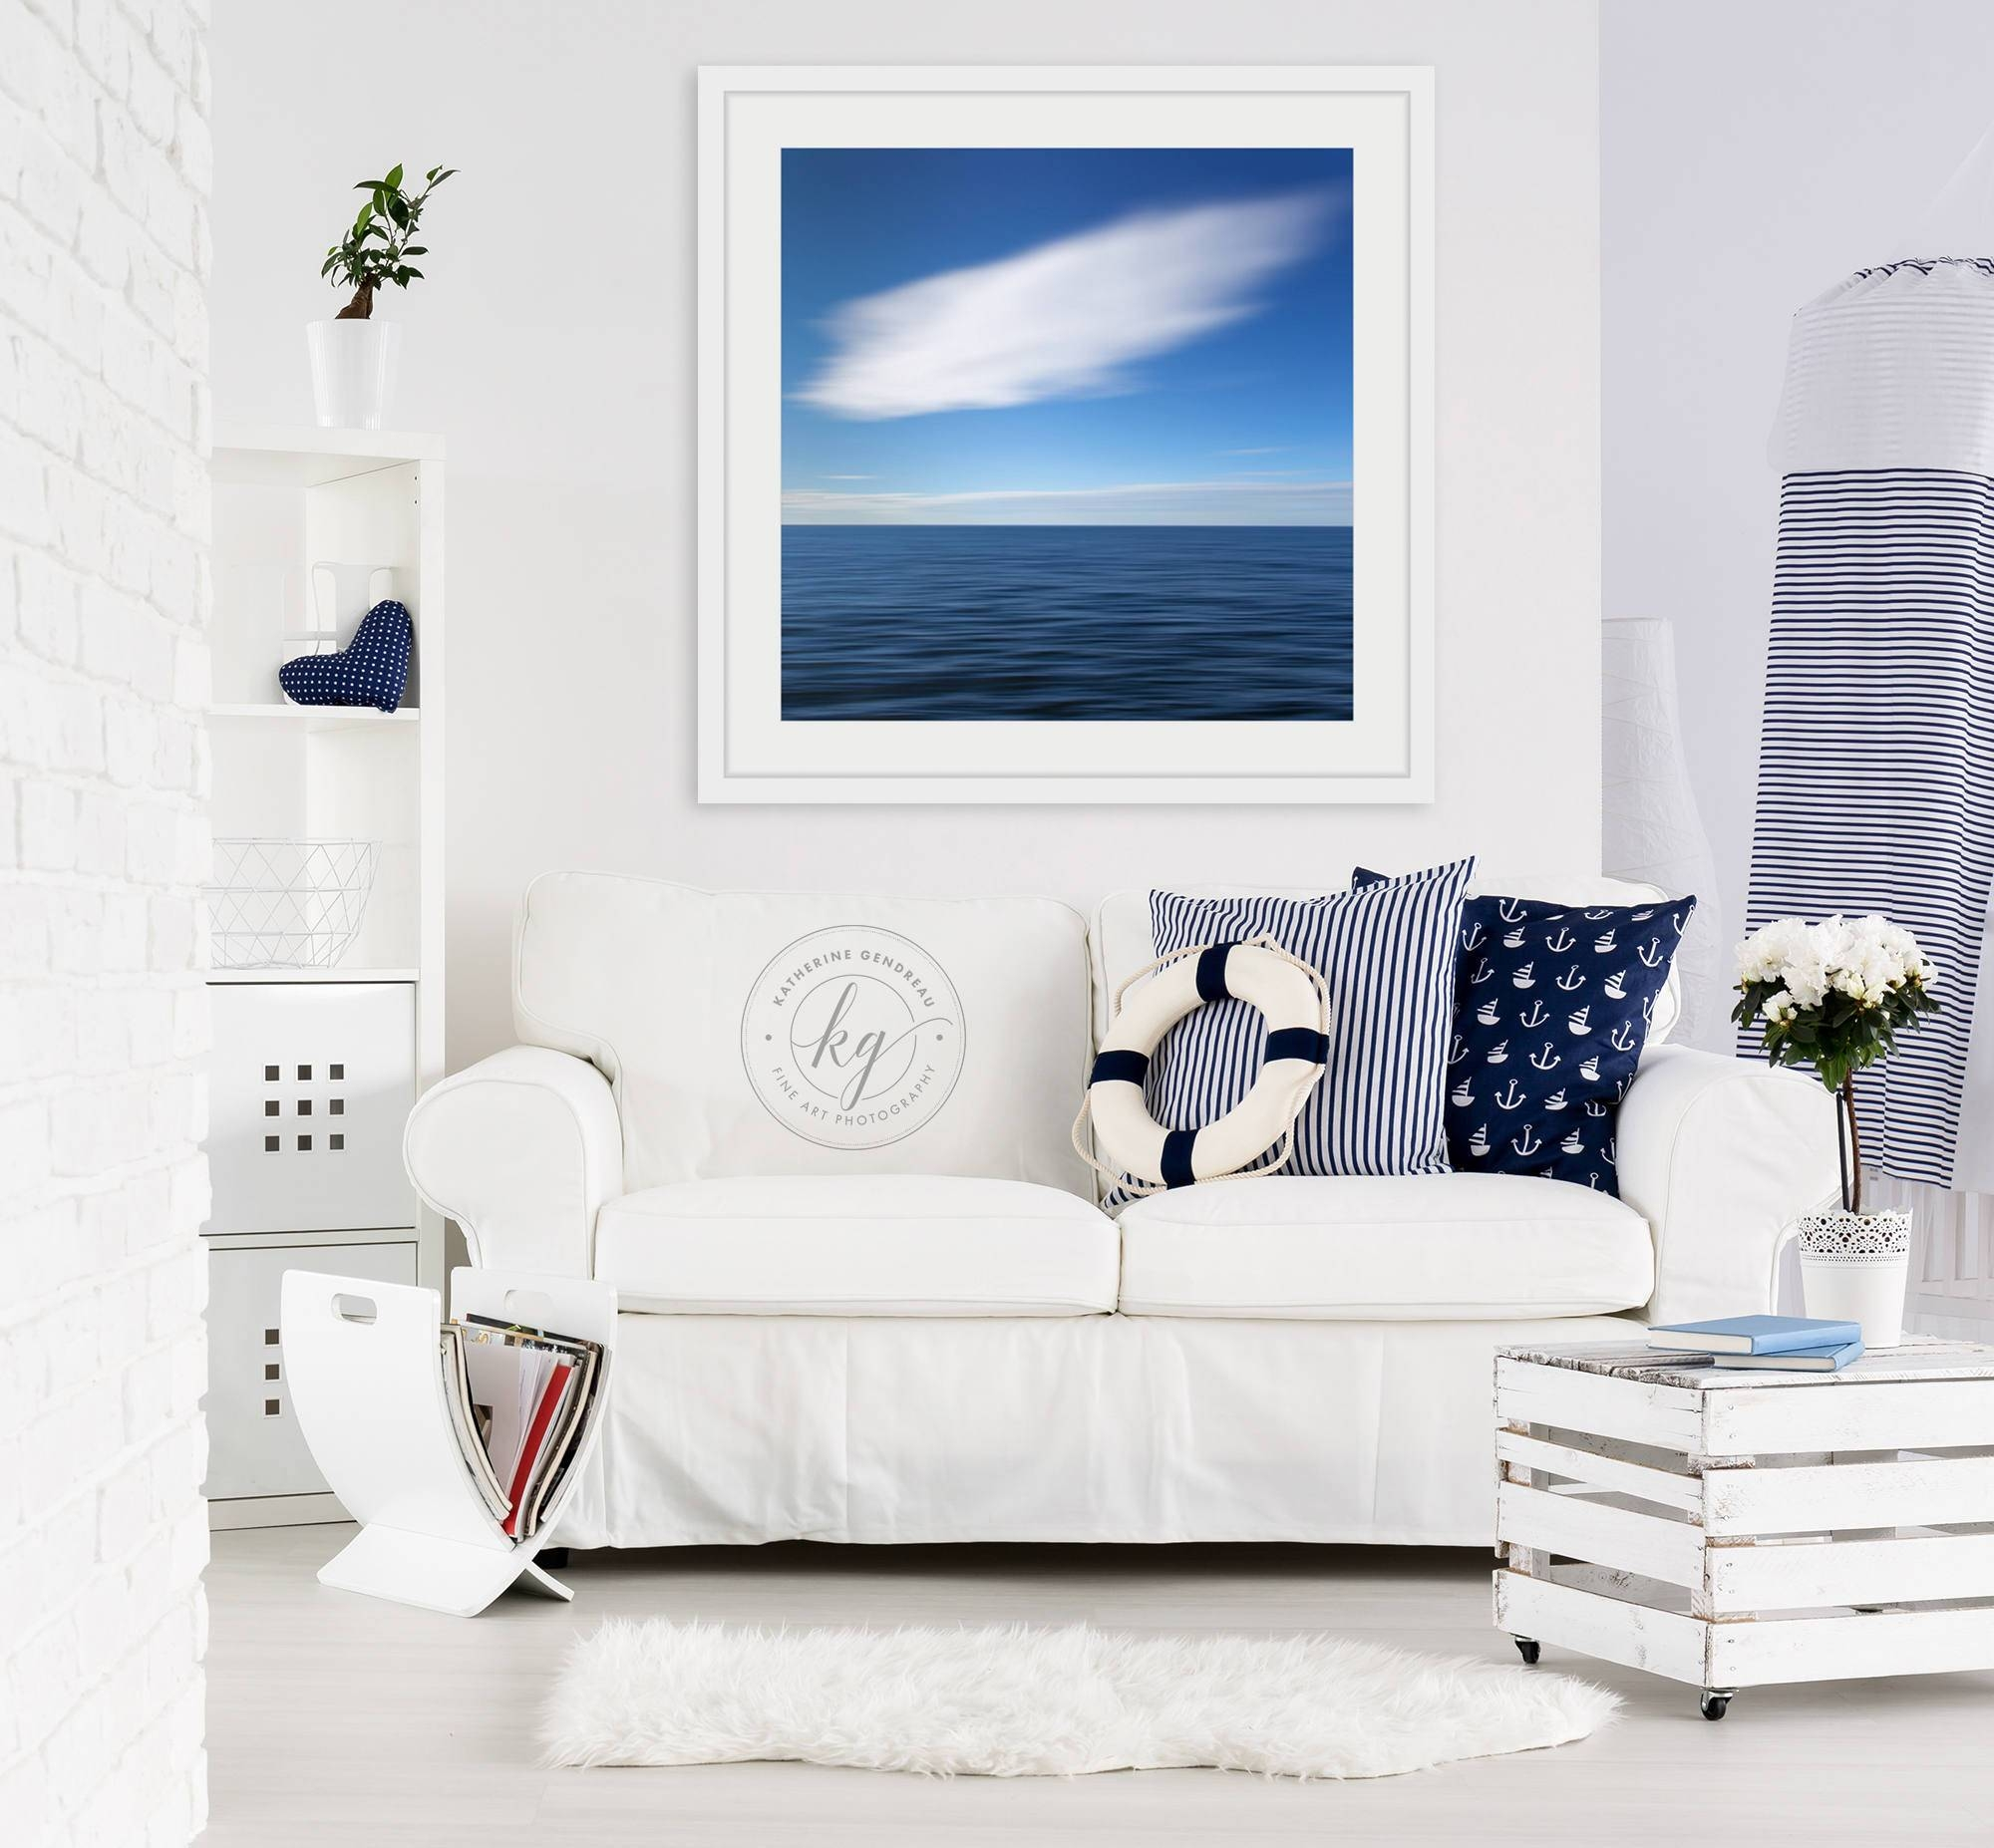 Framed Wall Art Abstract Art Beach Decor Ocean Photography For 2017 Framedcoastal Wall Art (View 15 of 20)